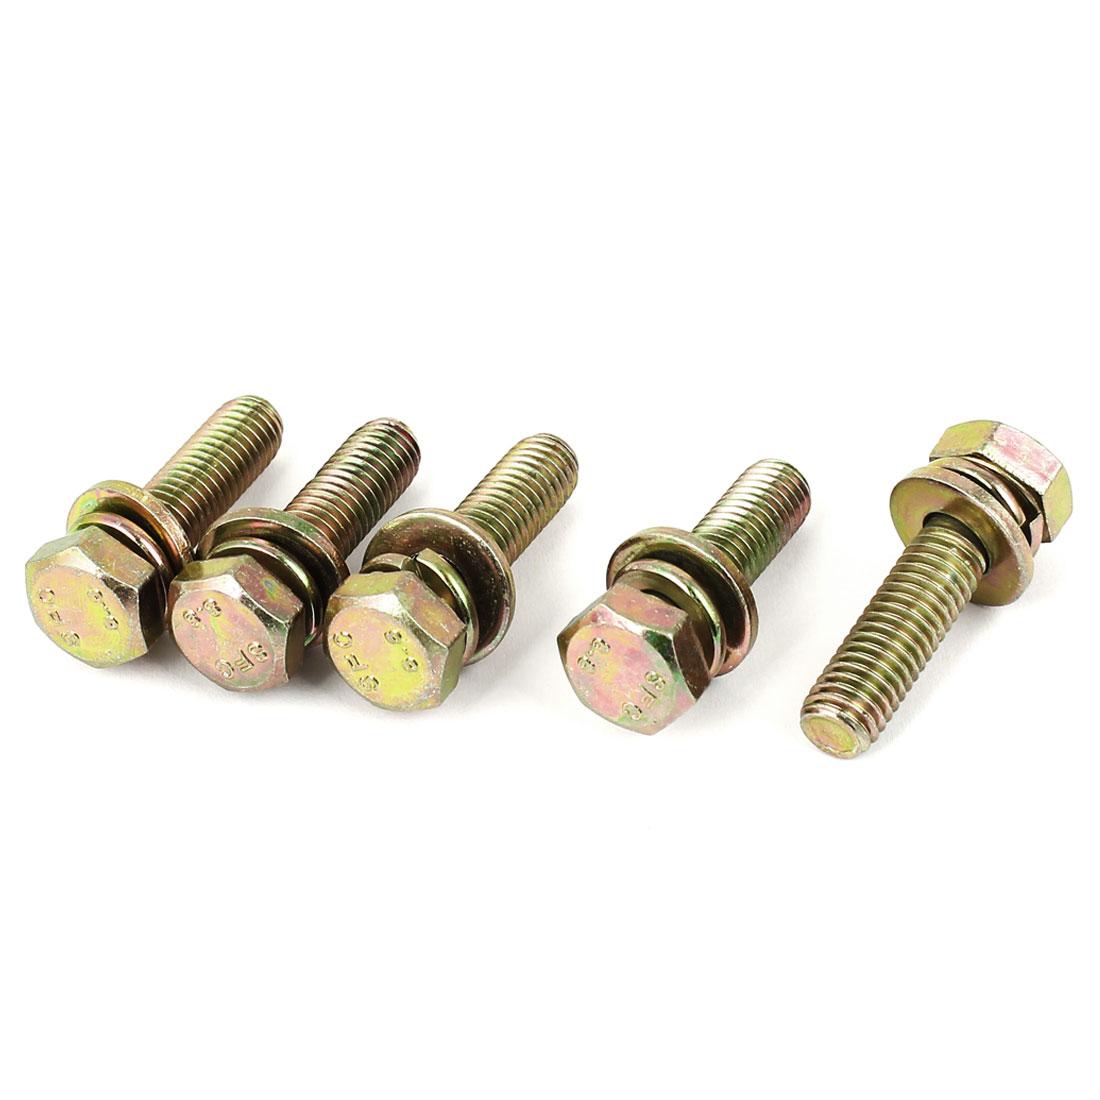 5pcs M8x30mm 8.8 Grade Yellow Zinc Plated Hex Head Bolt w Washer